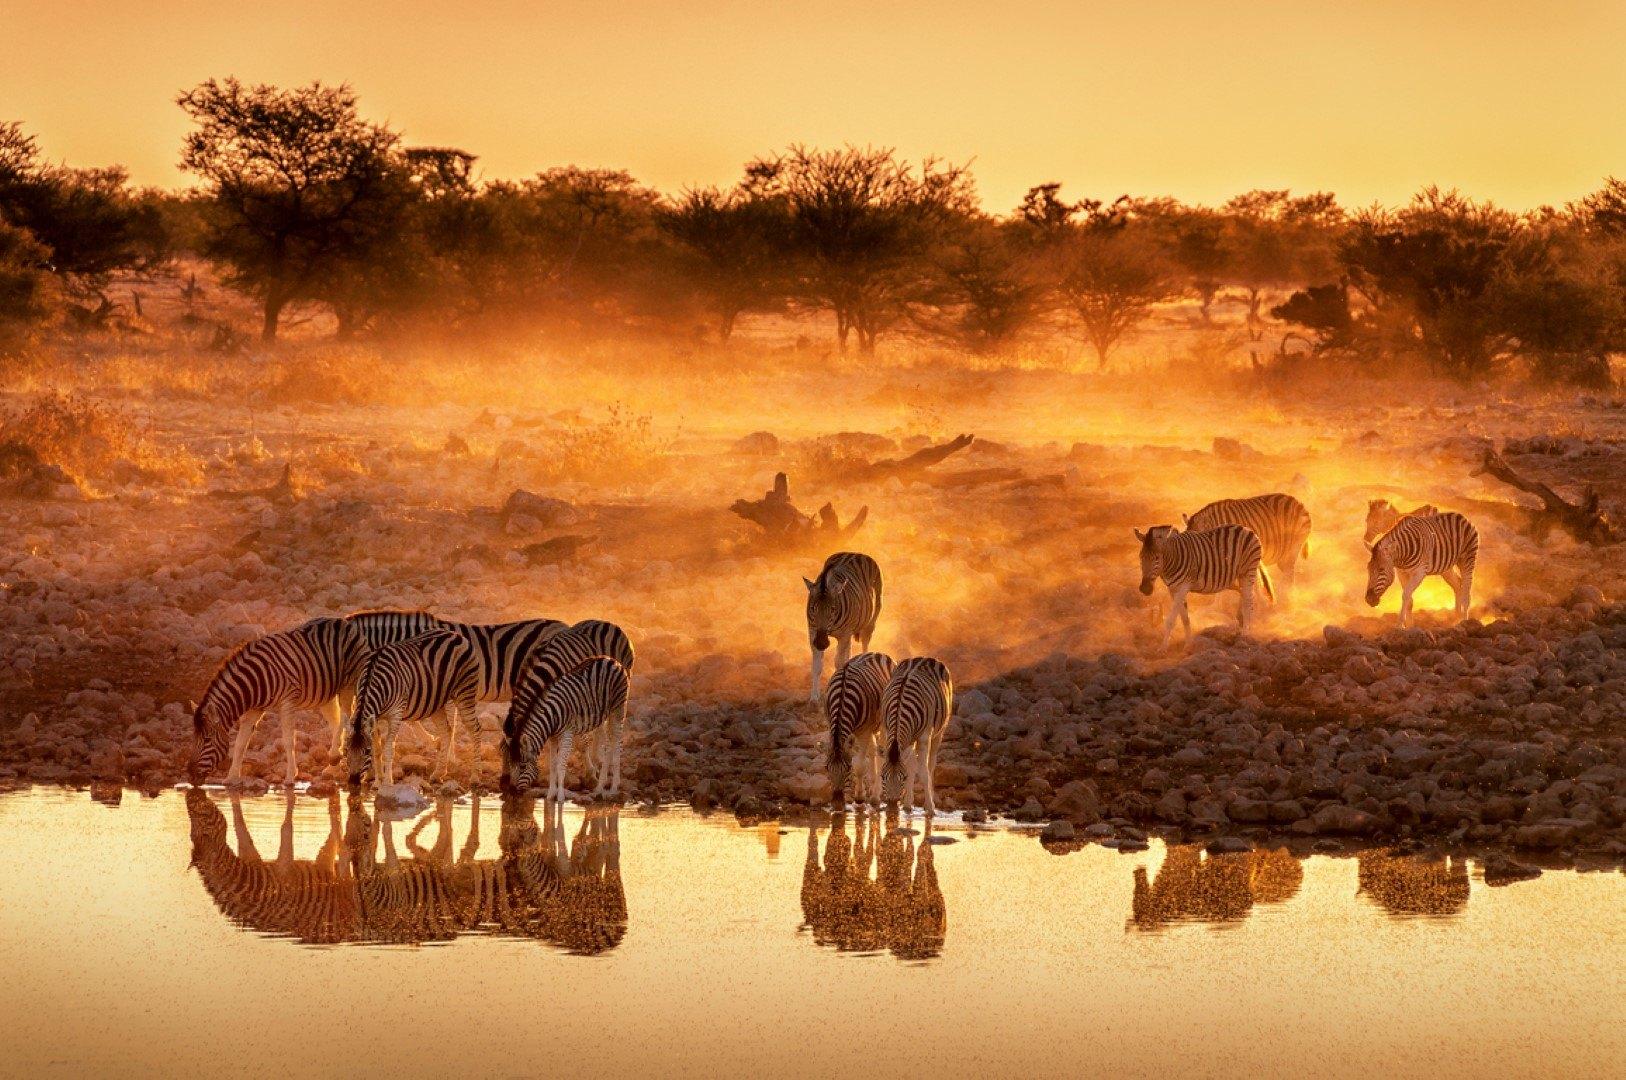 Zebras am Wasserloch bei Sonnenuntergang